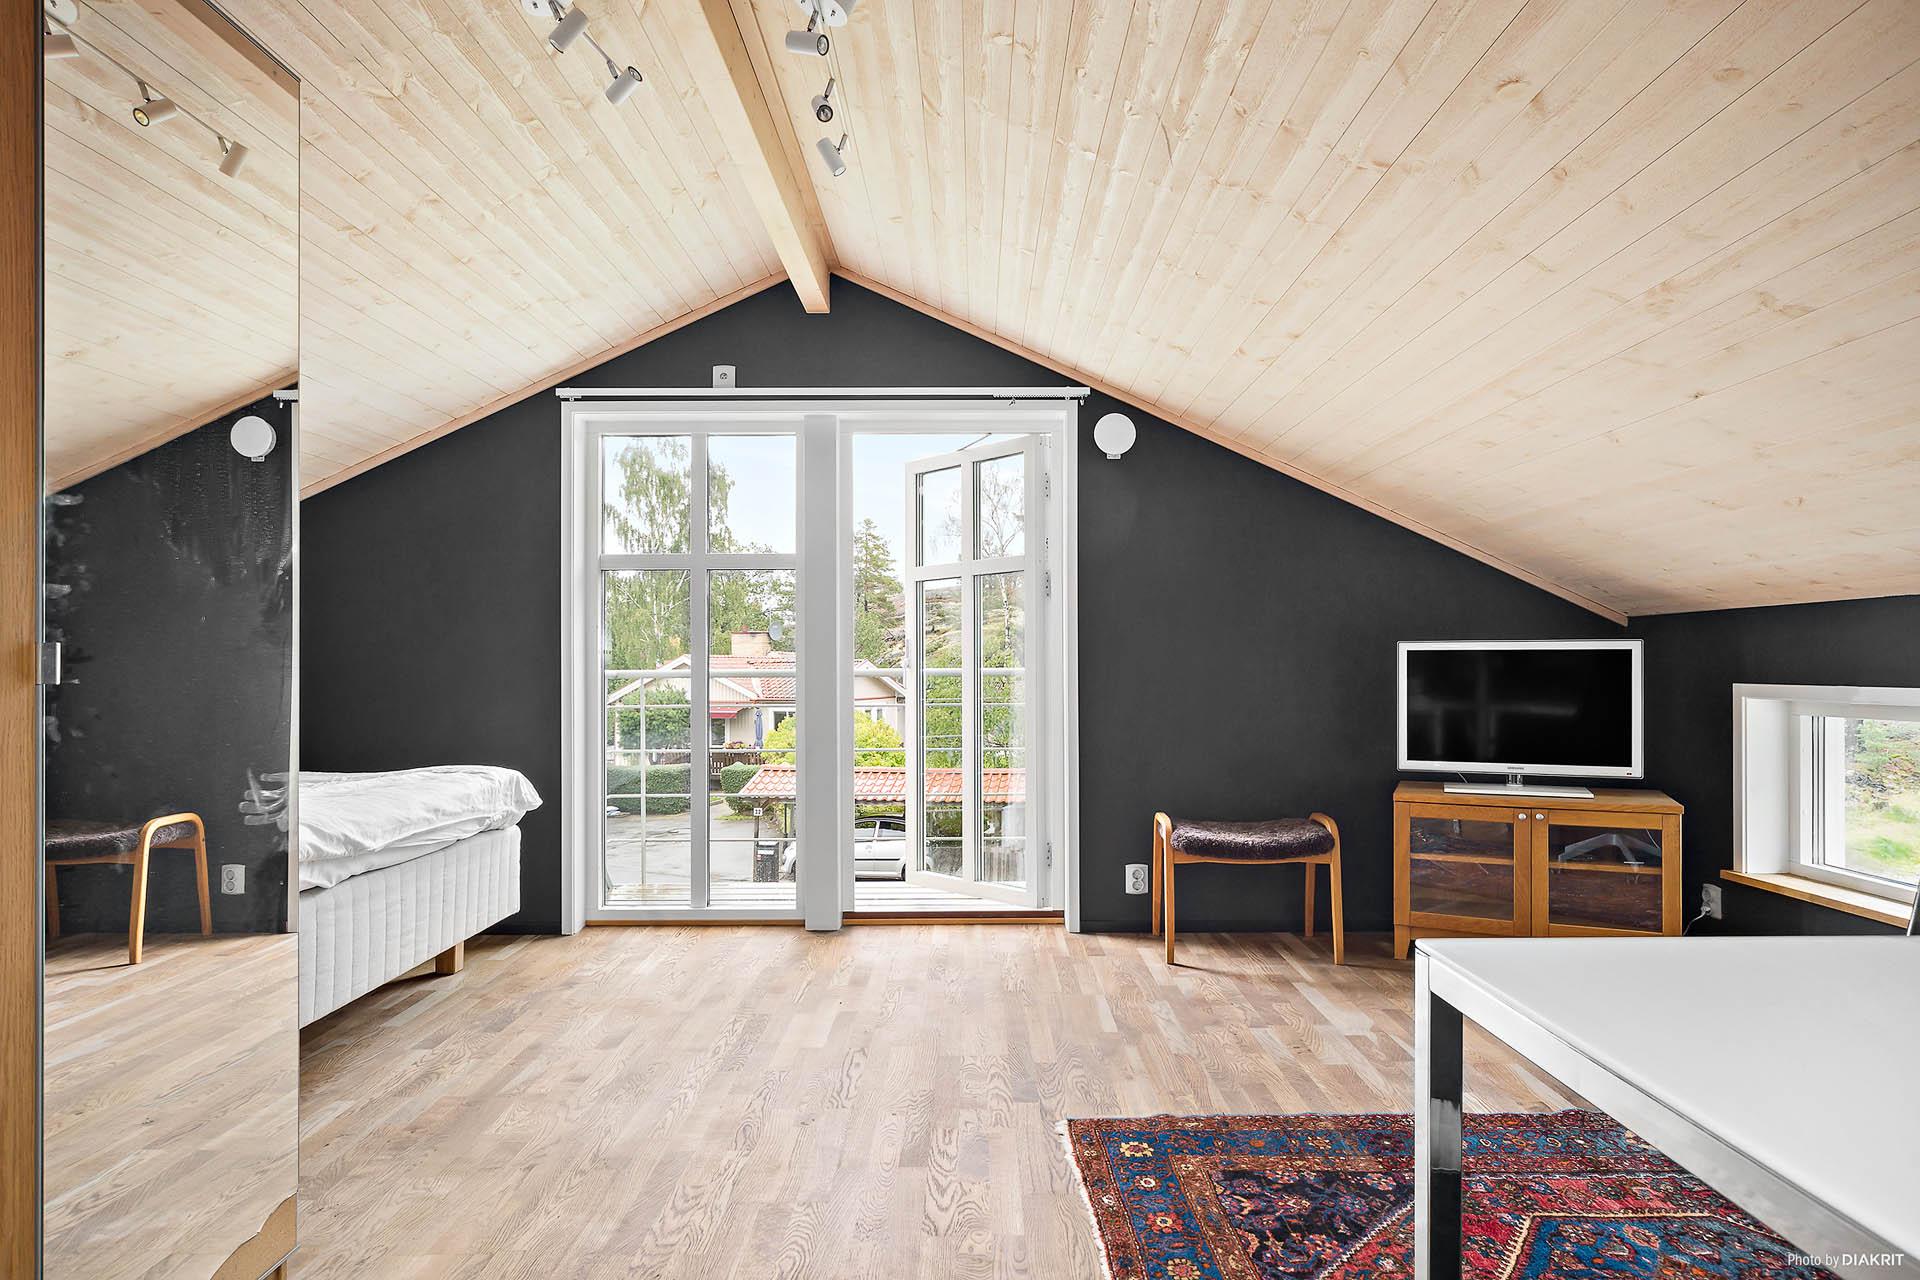 Ett av två sovrum på övre plan